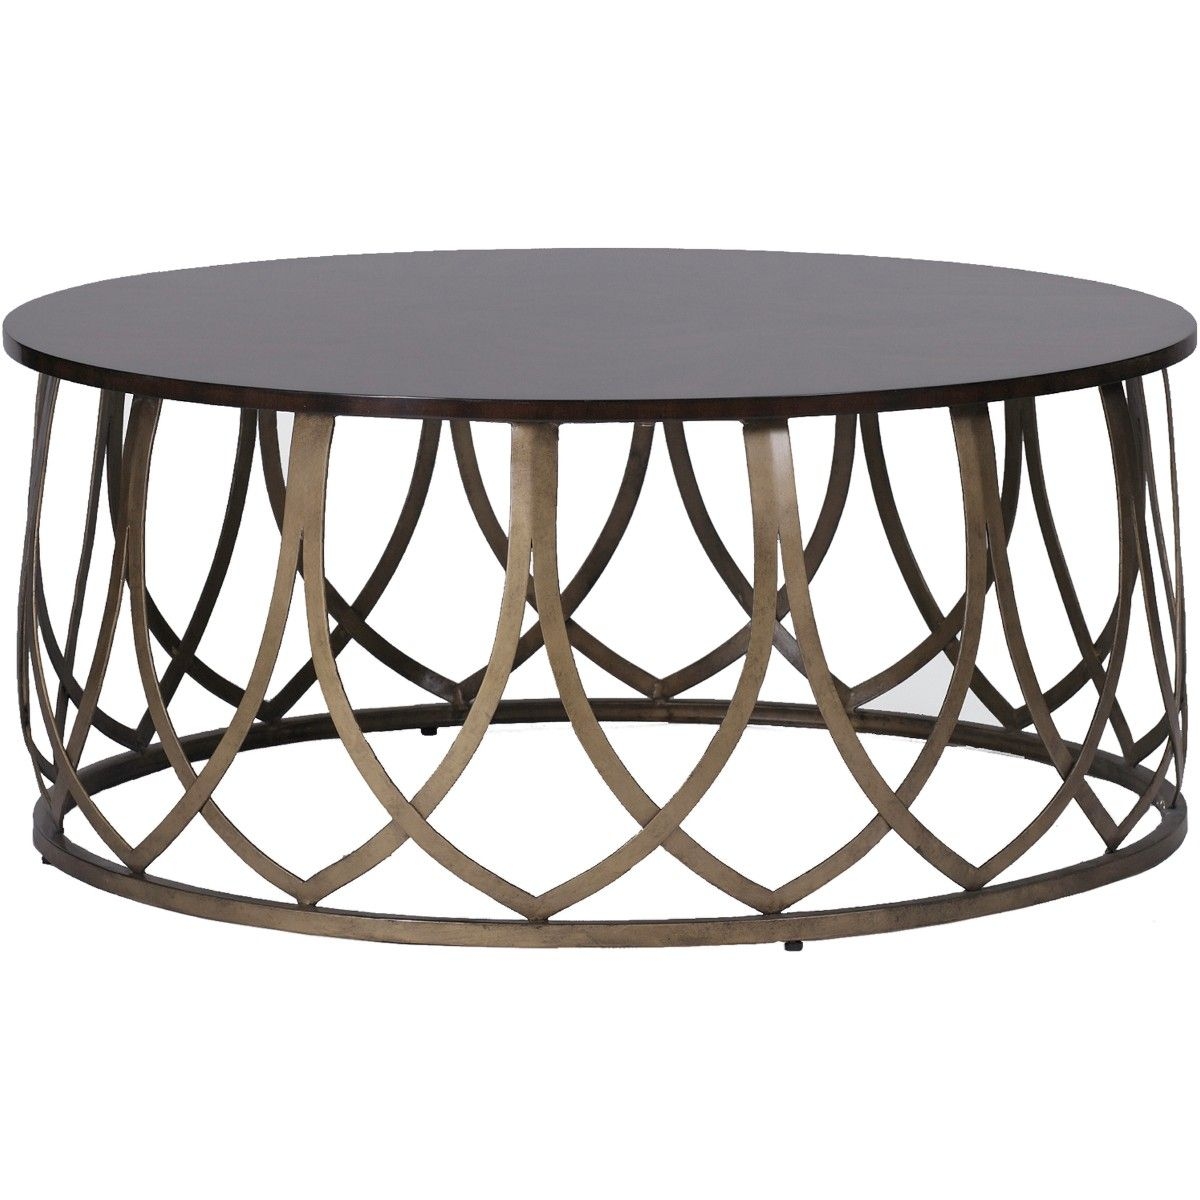 Gabby Jenkins Coffee Table Round Metal Coffee Table Cool Coffee Tables Coffee Table Design [ 1200 x 1200 Pixel ]